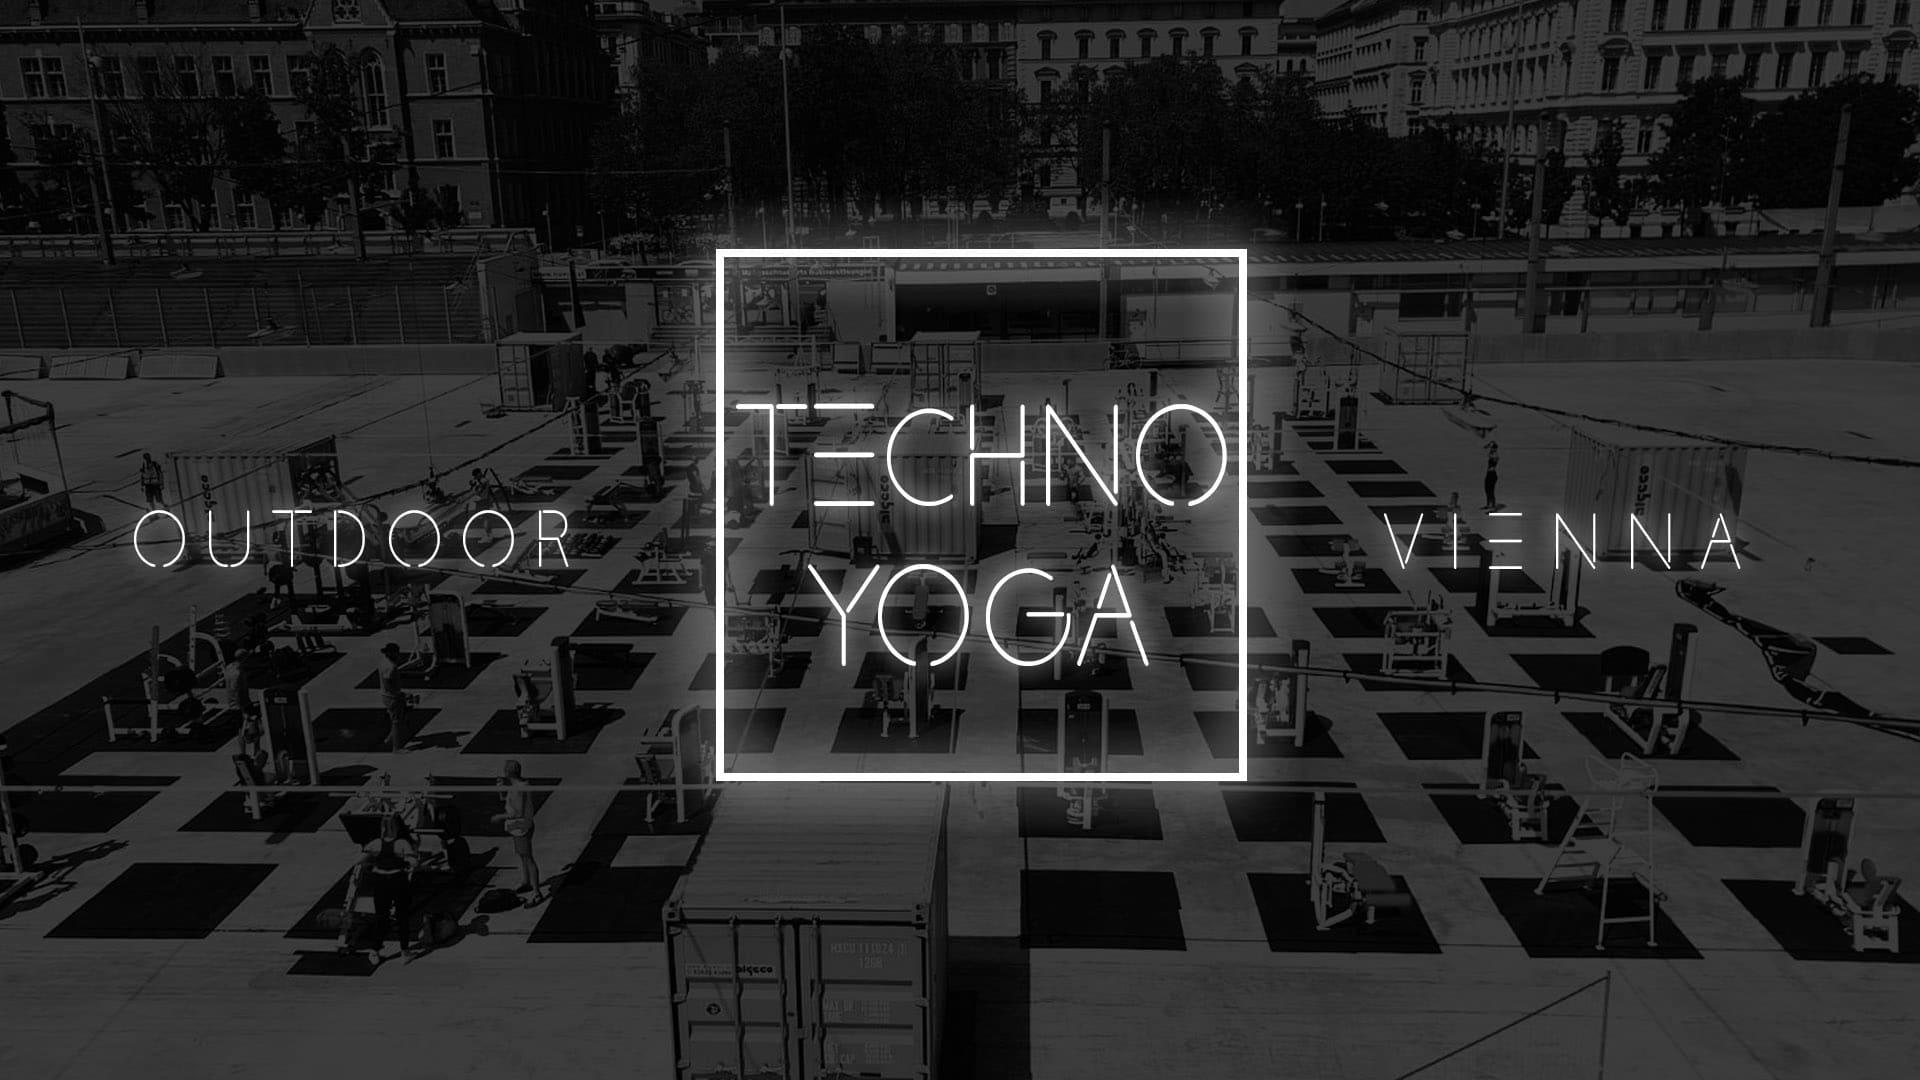 Events Wien: Techno Yoga Vienna – Outdoor